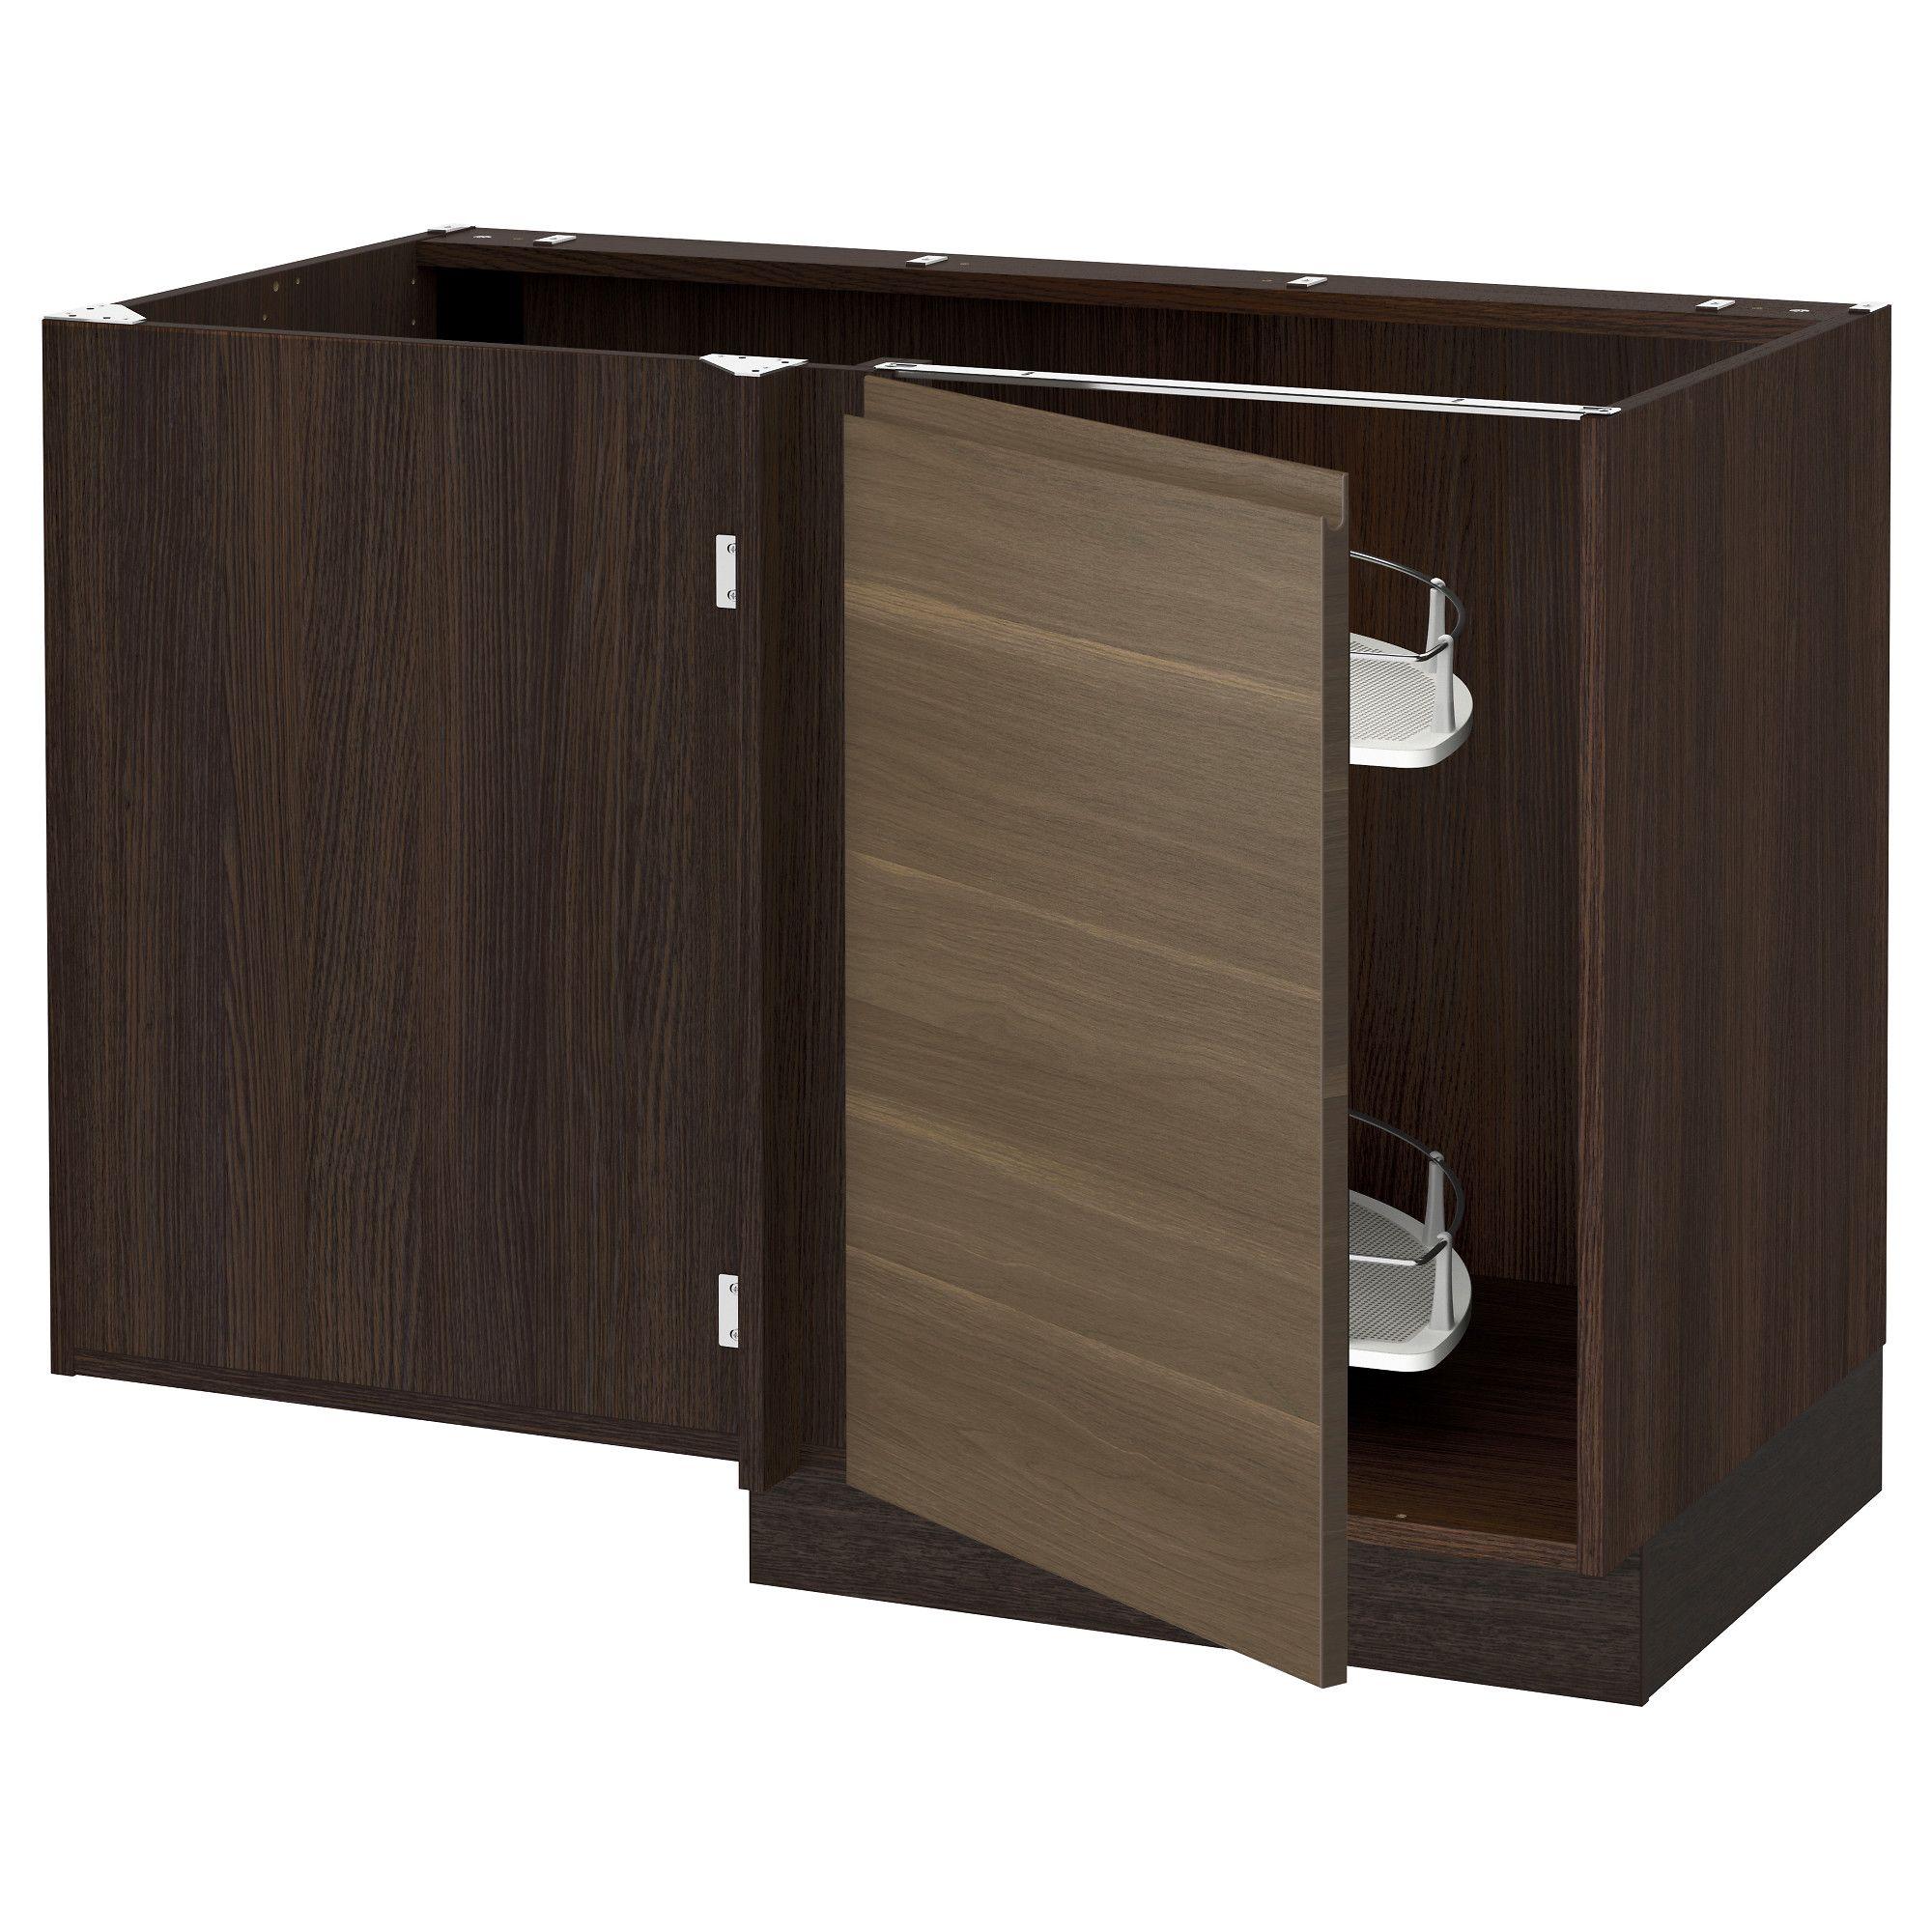 Best Furniture And Home Furnishings Corner Base Cabinet Base 400 x 300